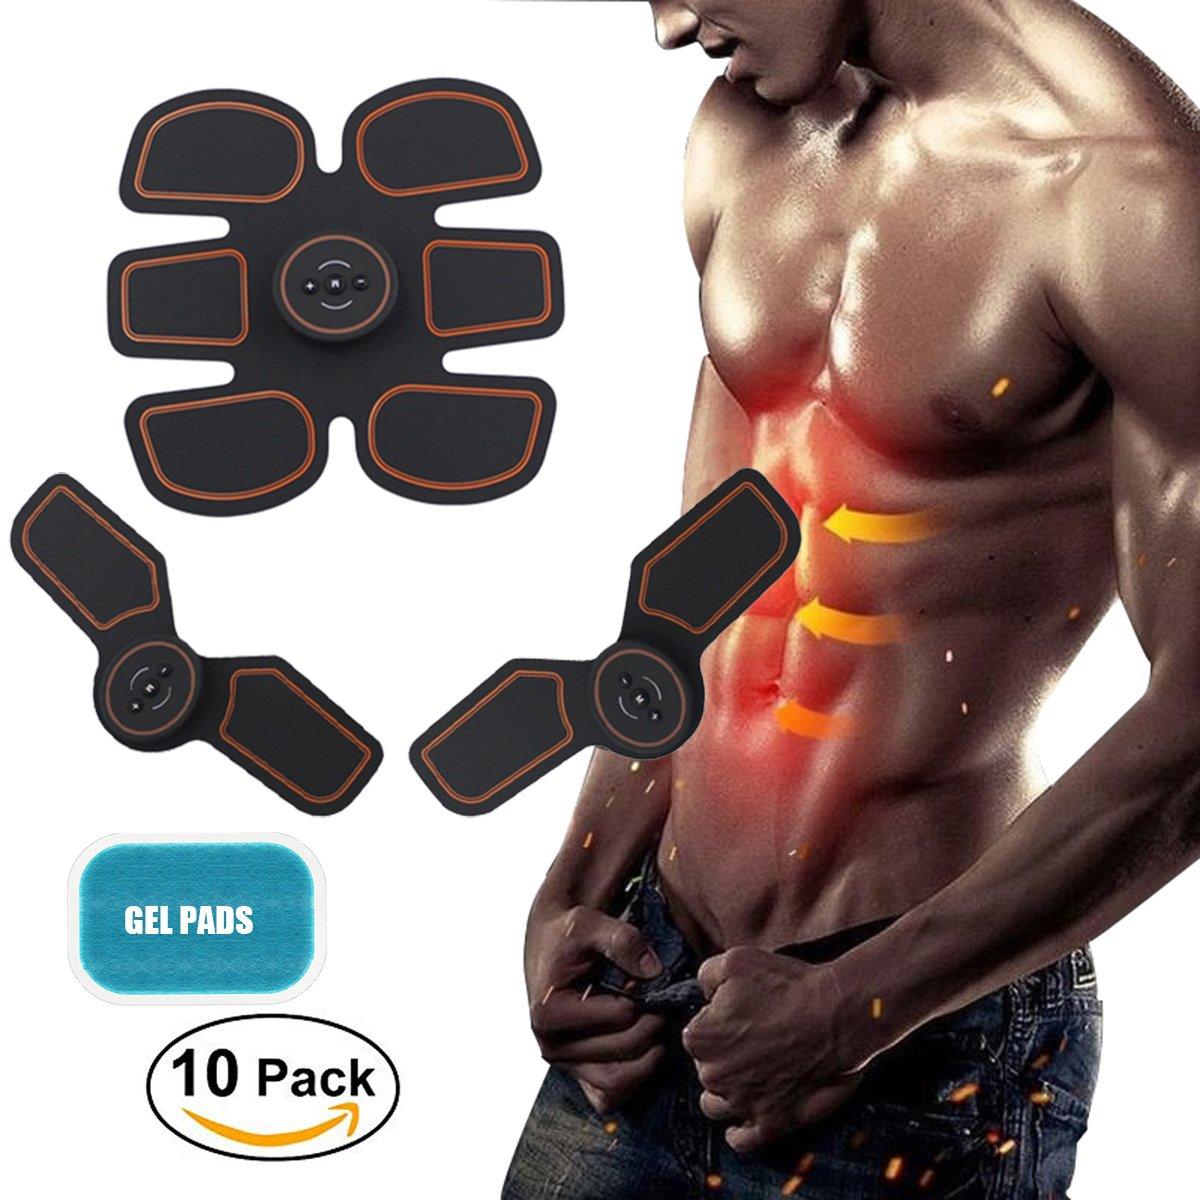 ABS刺激装置、腹部用充電式腹部筋肉トレーニングファットバーナー B07HDBHLTW ブラック、男性用/女性用ポータブルマッスルトレーナー ブラック B07HDBHLTW, チアーズR店:e1352abf --- mail.tastykhabar.com